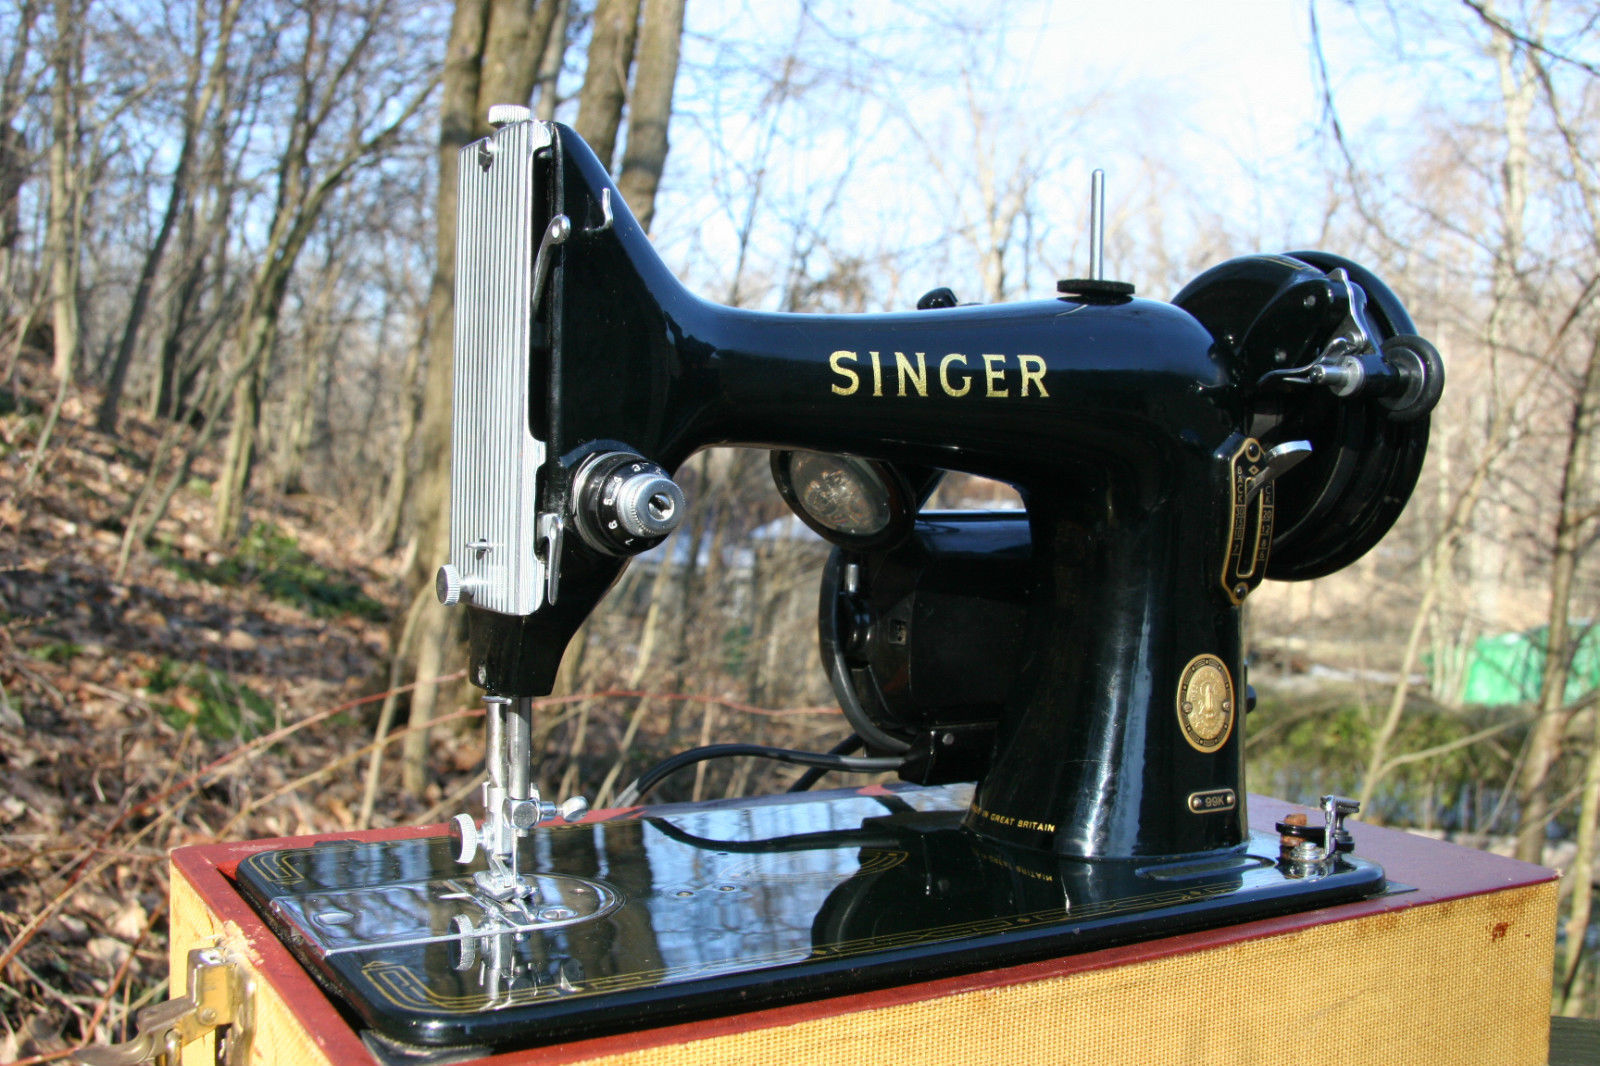 Singer Sewing Machine 99K Belt Cover Guard Part # 33689 5 image 4